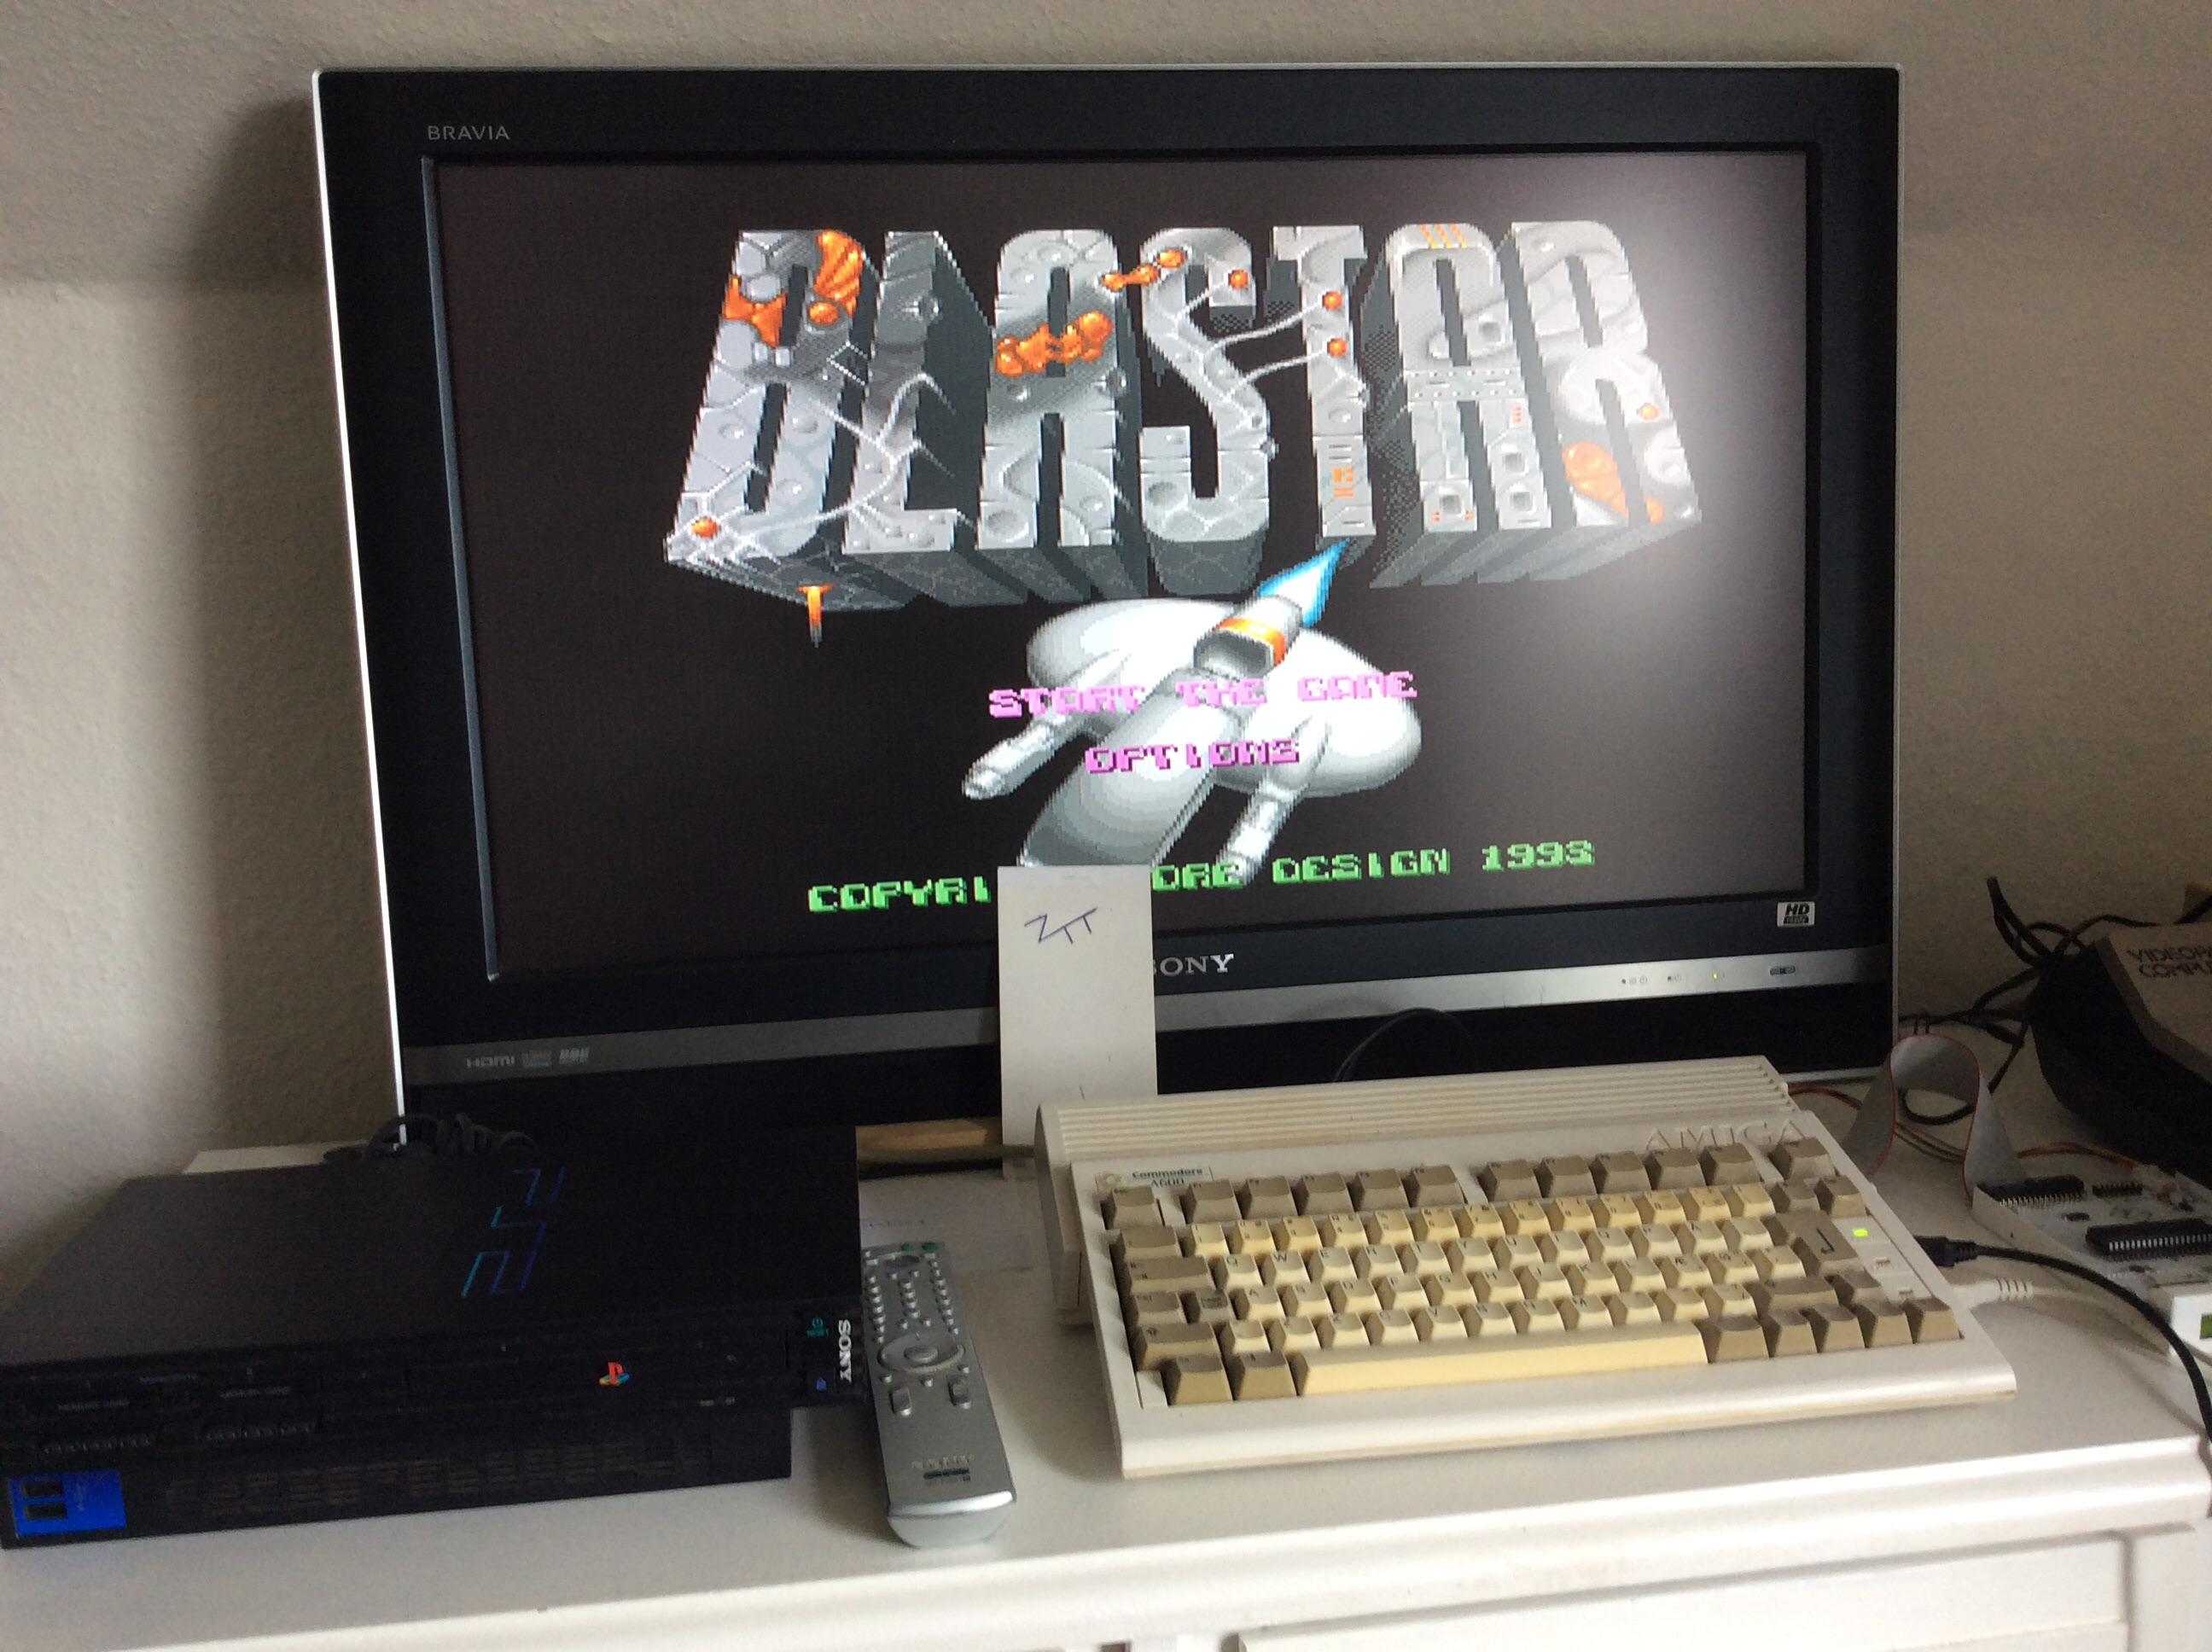 Frankie: Blastar [Normal] (Amiga) 37,750 points on 2016-08-08 07:19:15